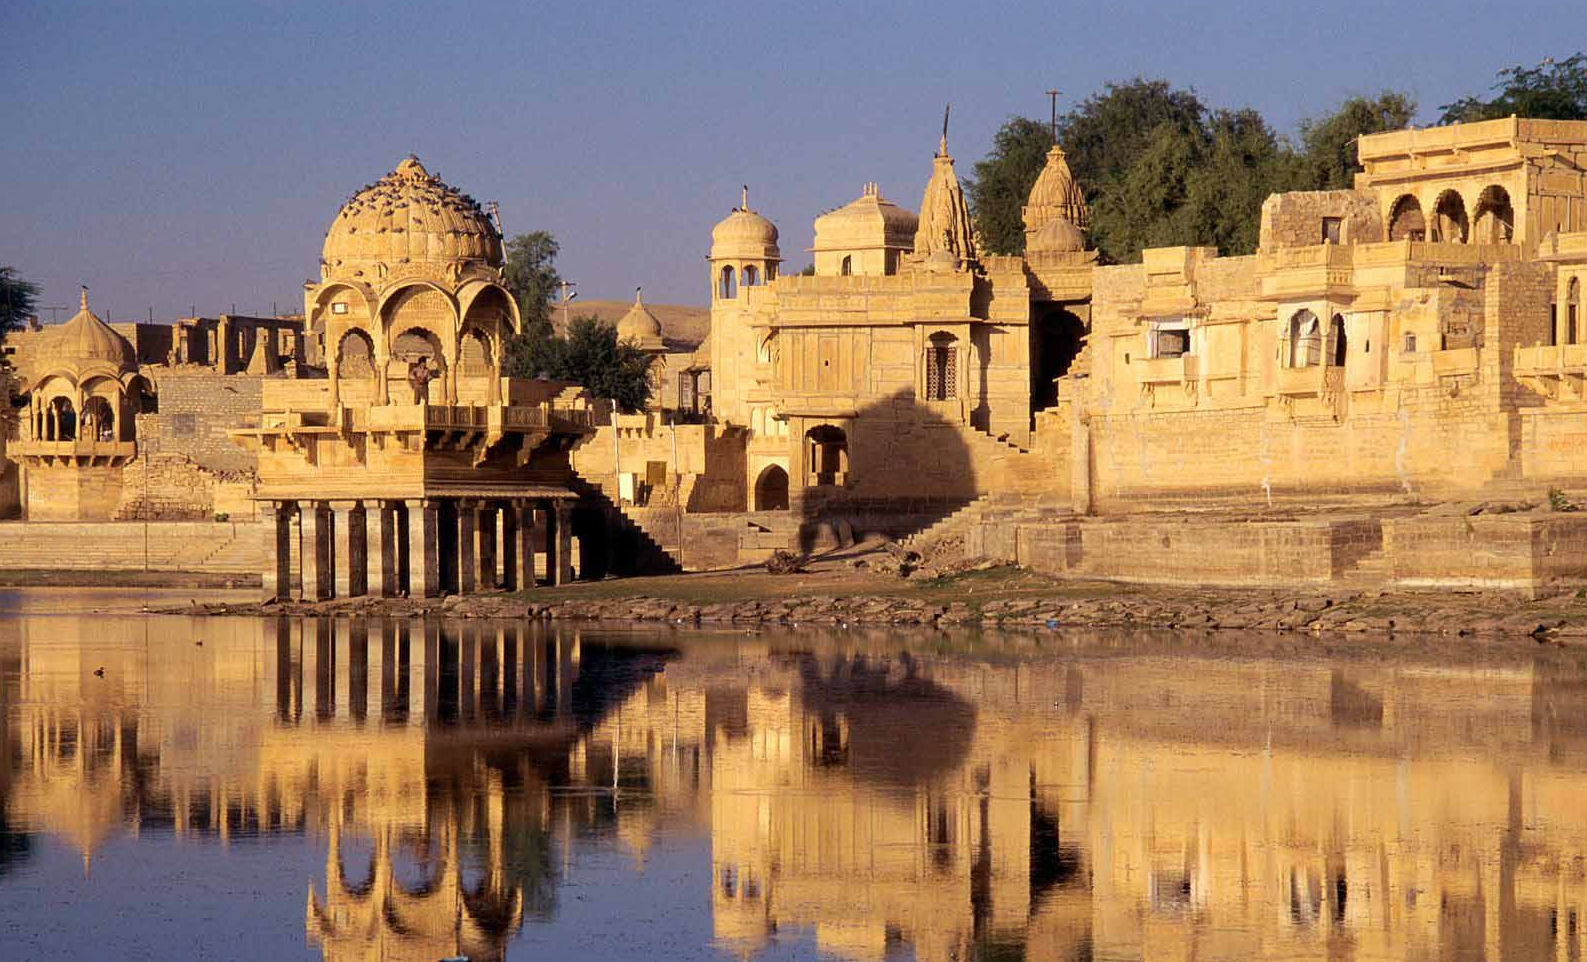 Jaisalmer Image